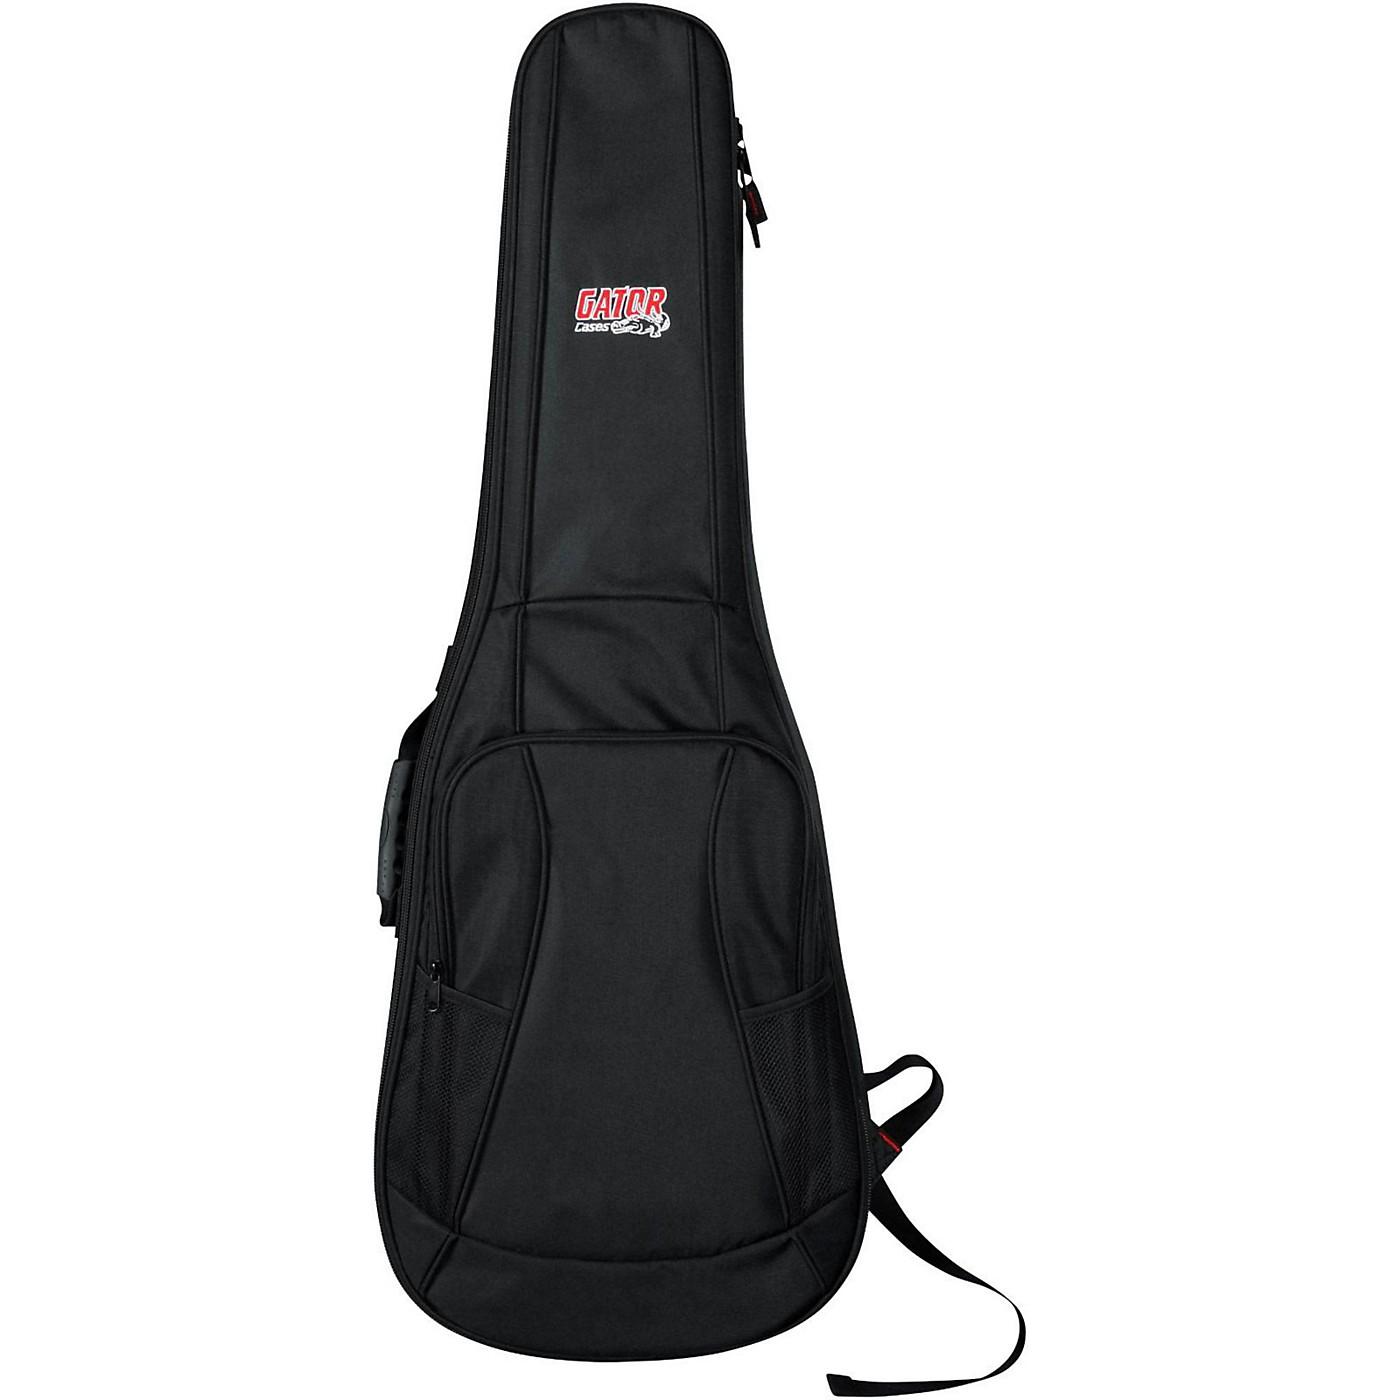 Gator GB-4G-ELECX2 4G Series Gig Bag for 2 Electric Guitars thumbnail